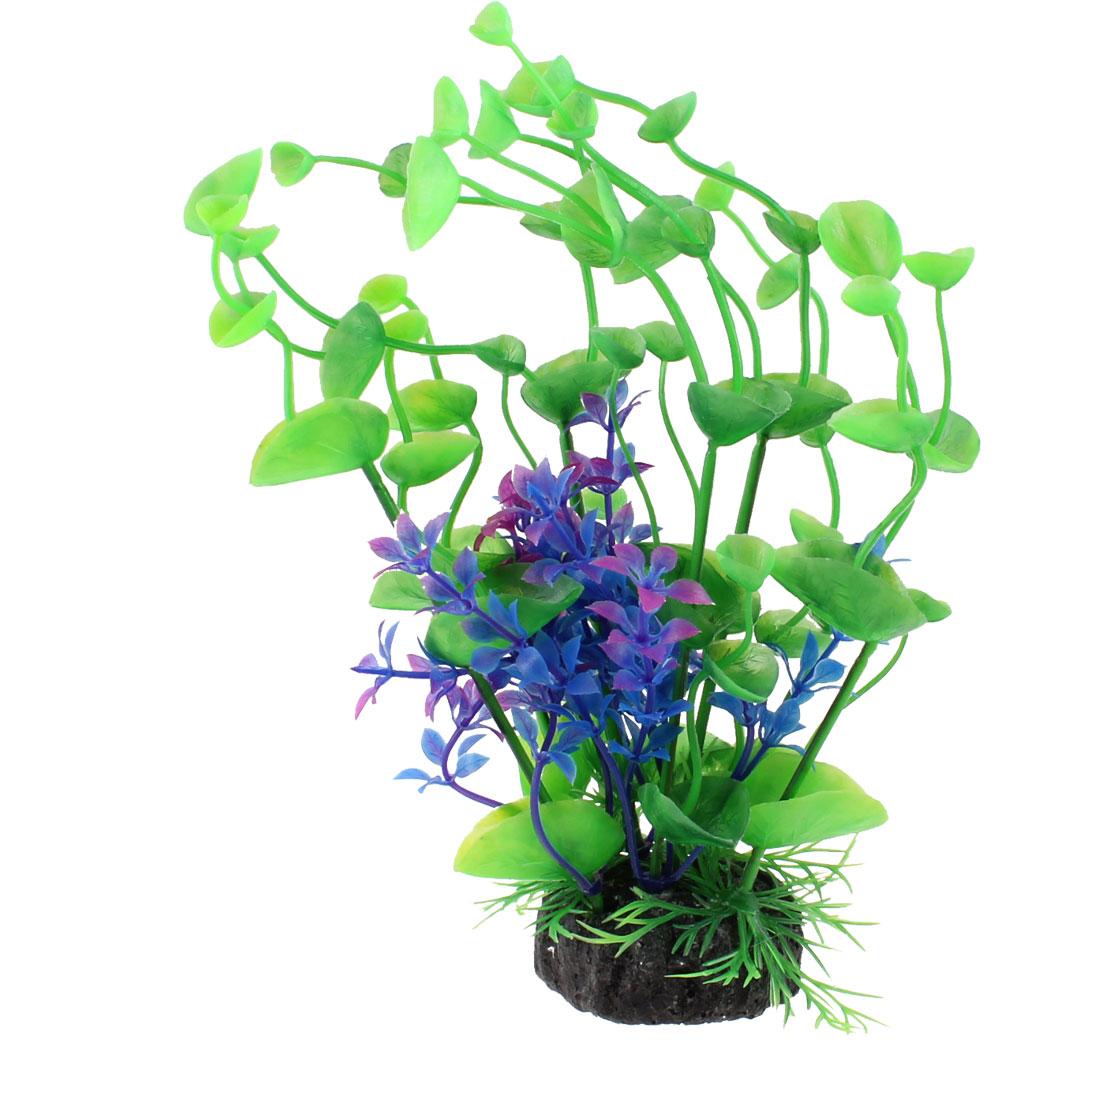 Ceramic Base Royal Blue Green Plastic Grass Plant Decoration for Aquarium